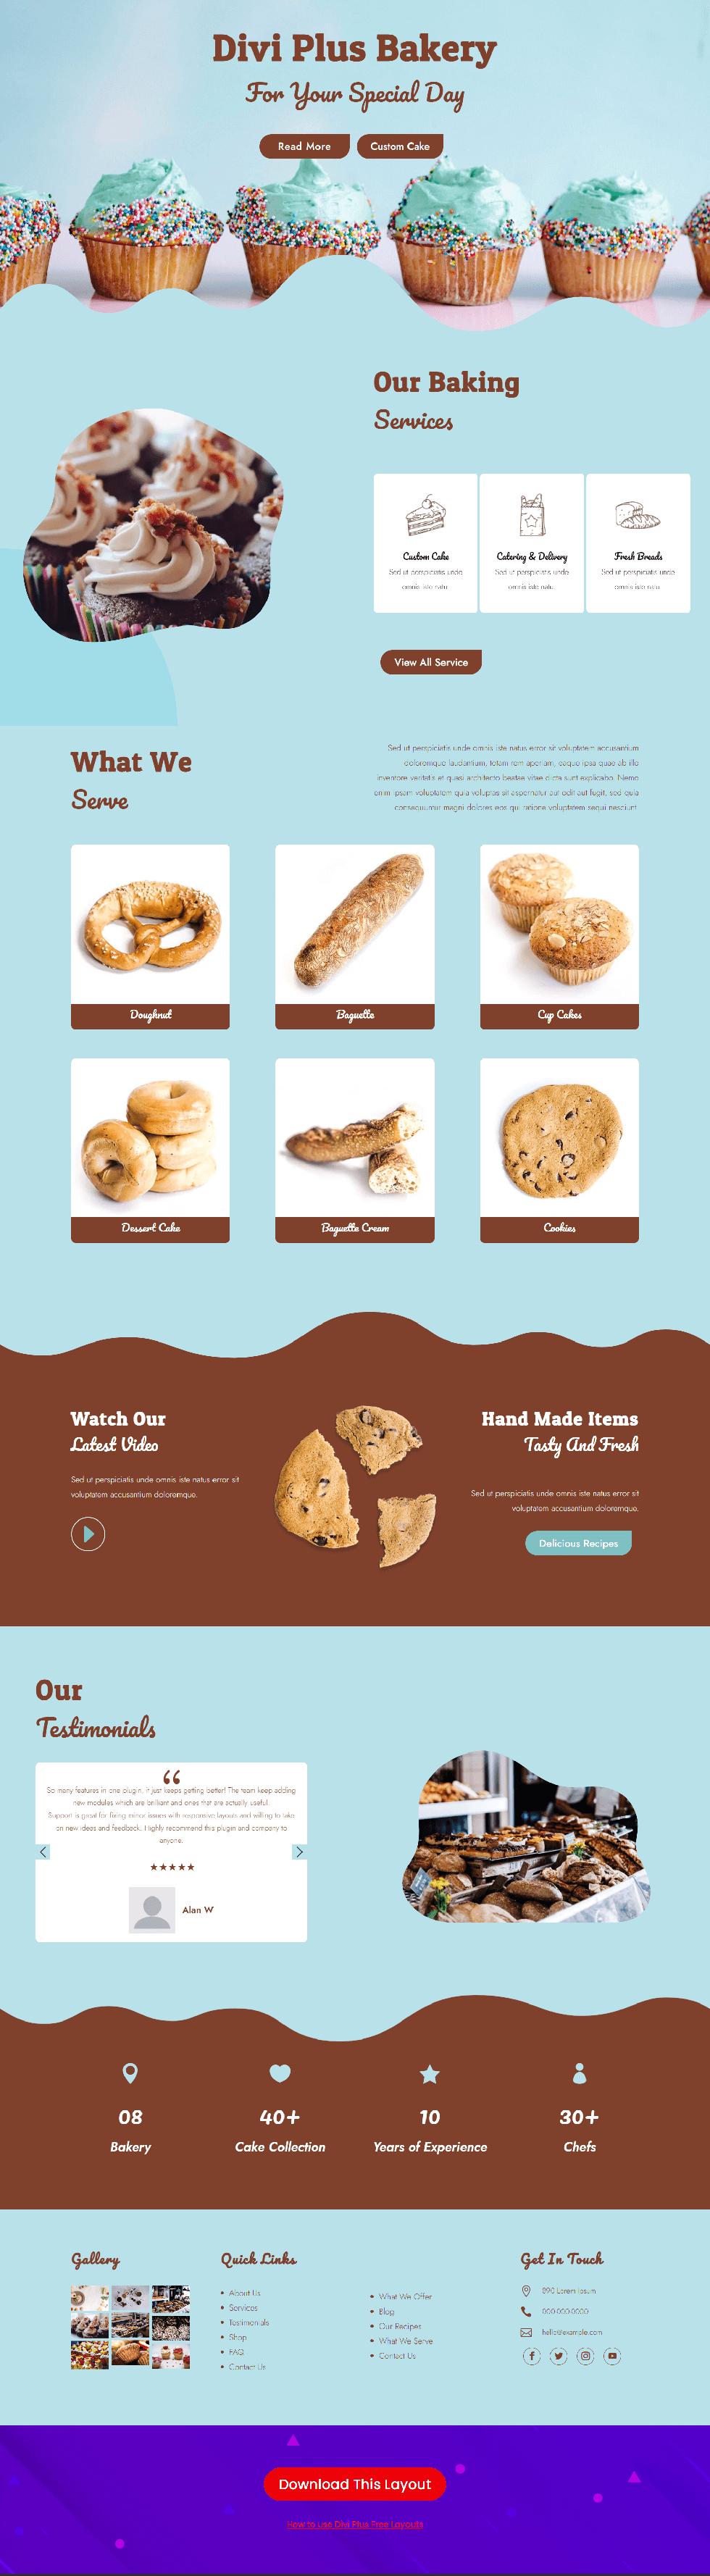 Divi Plus Bakery Image